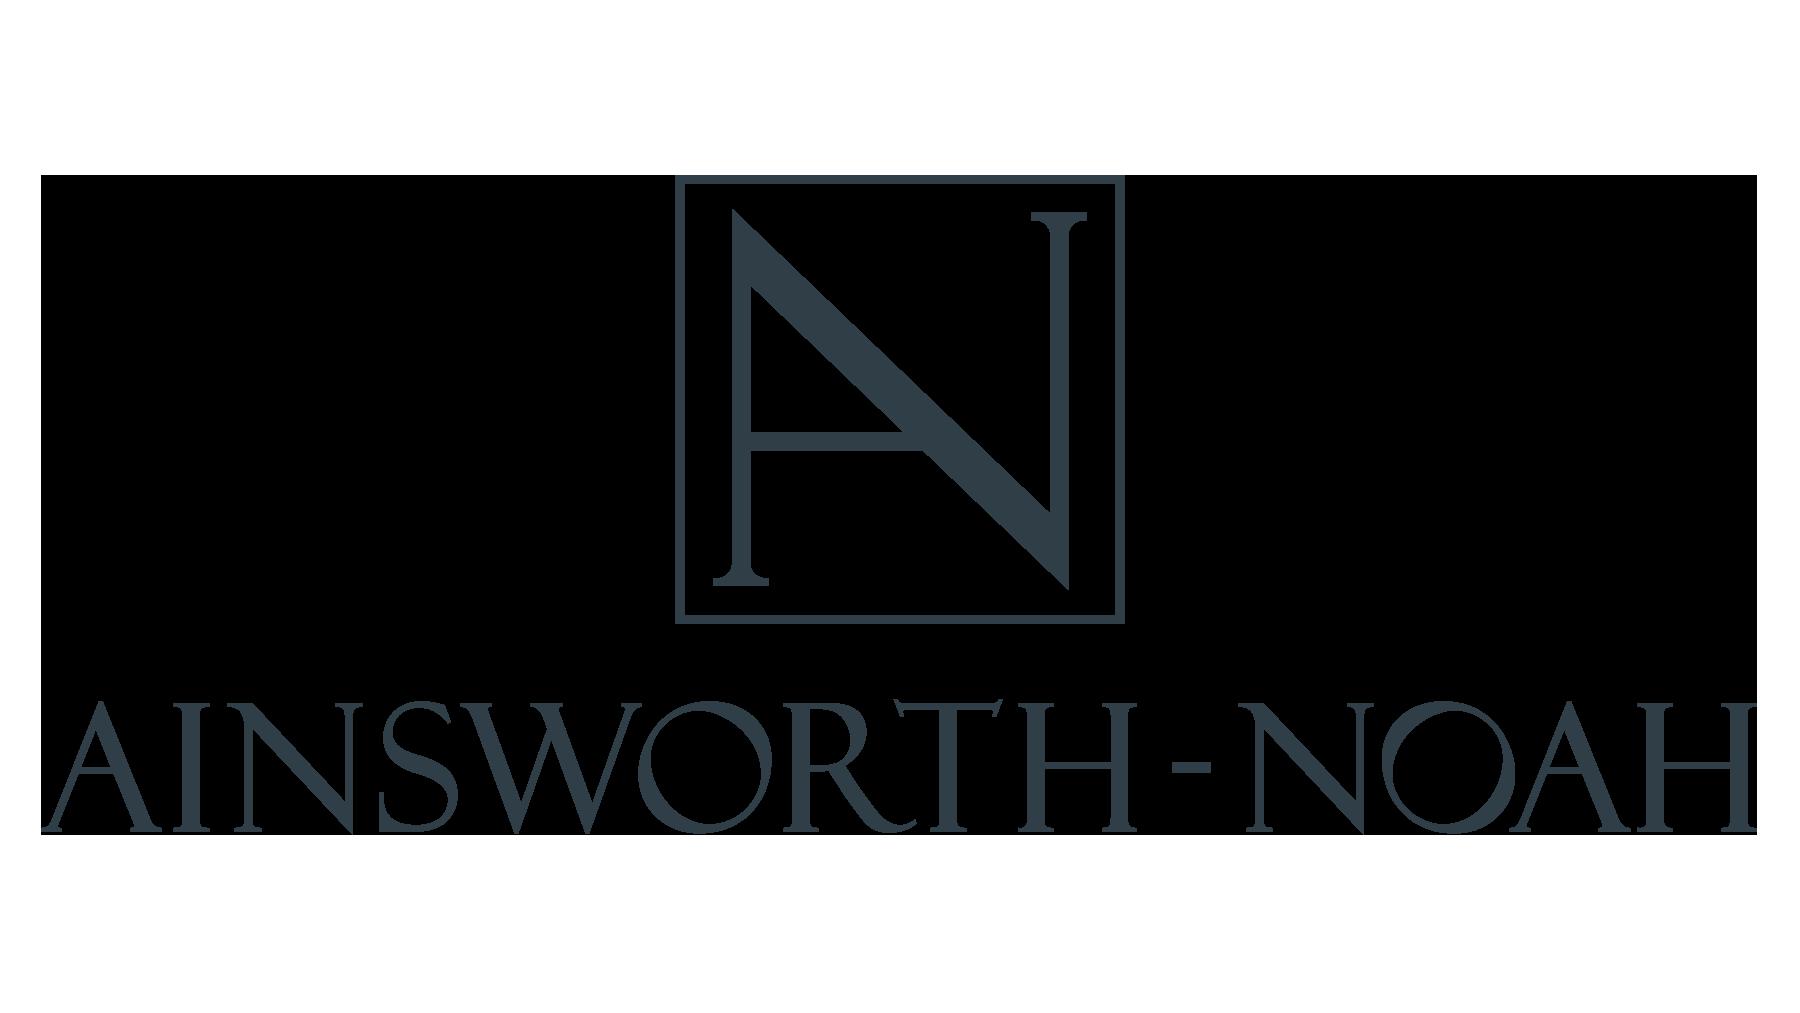 Ainsworth-Noah logo, 2021 Flower magazine showhouse sponsor